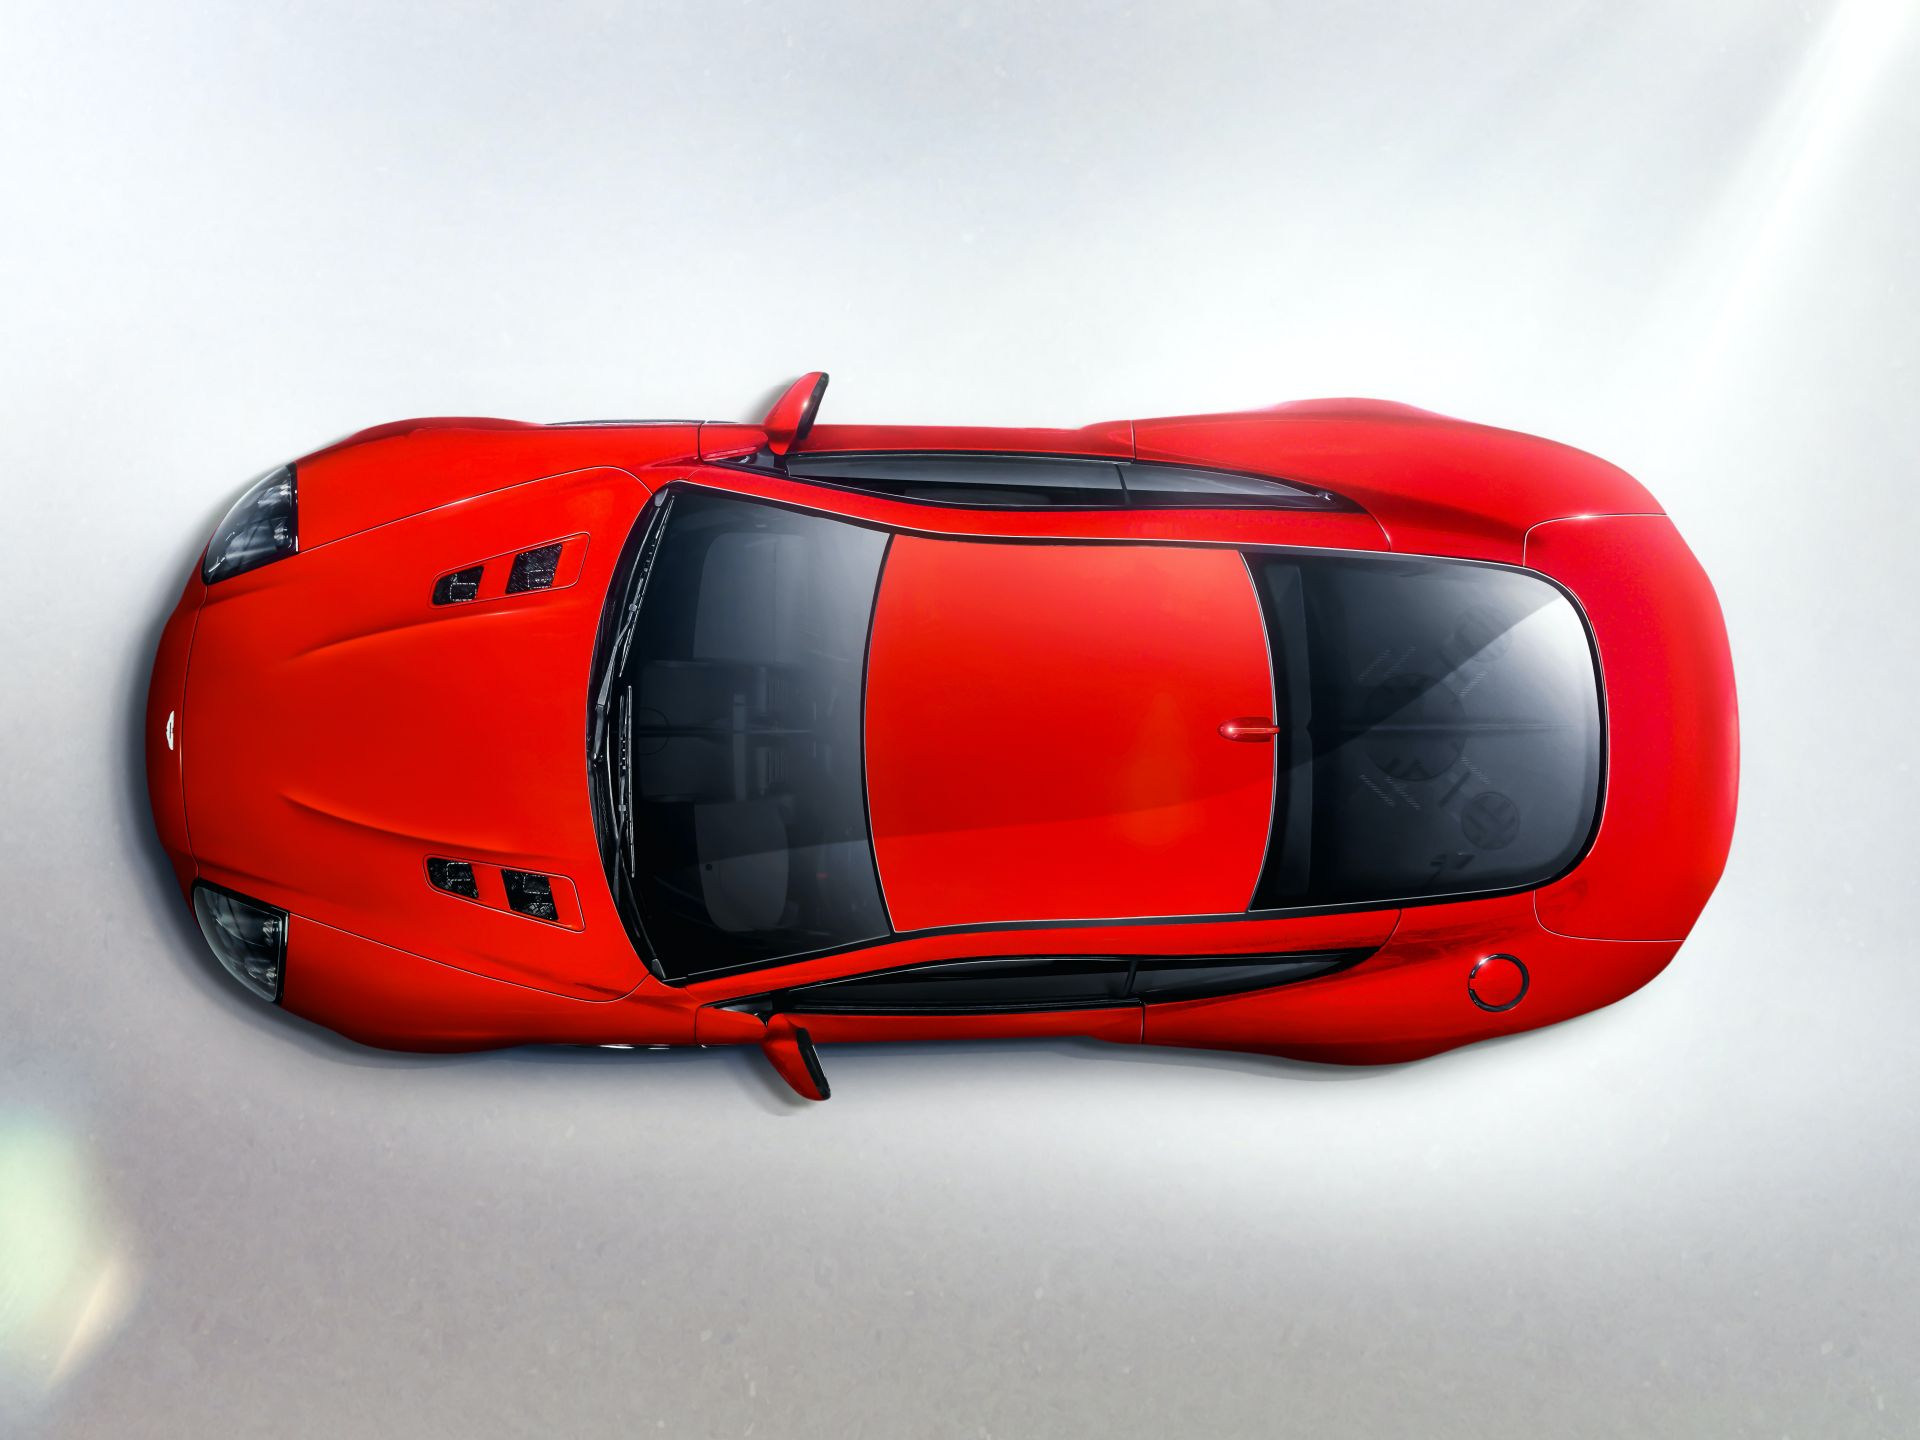 Aston-Martin-Callum-Vanquish-25-By-R-Reforged-10